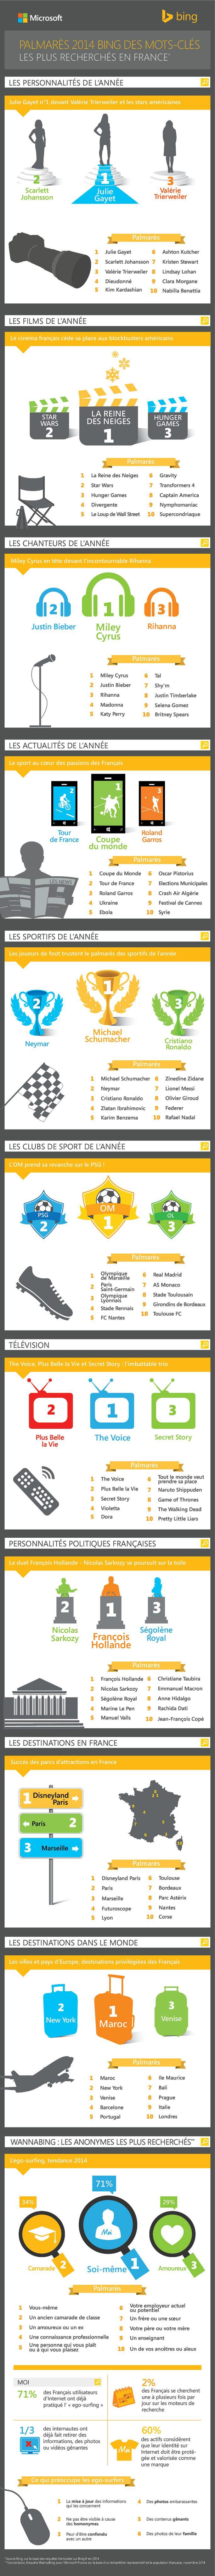 Bing-infographie-palmares-2014